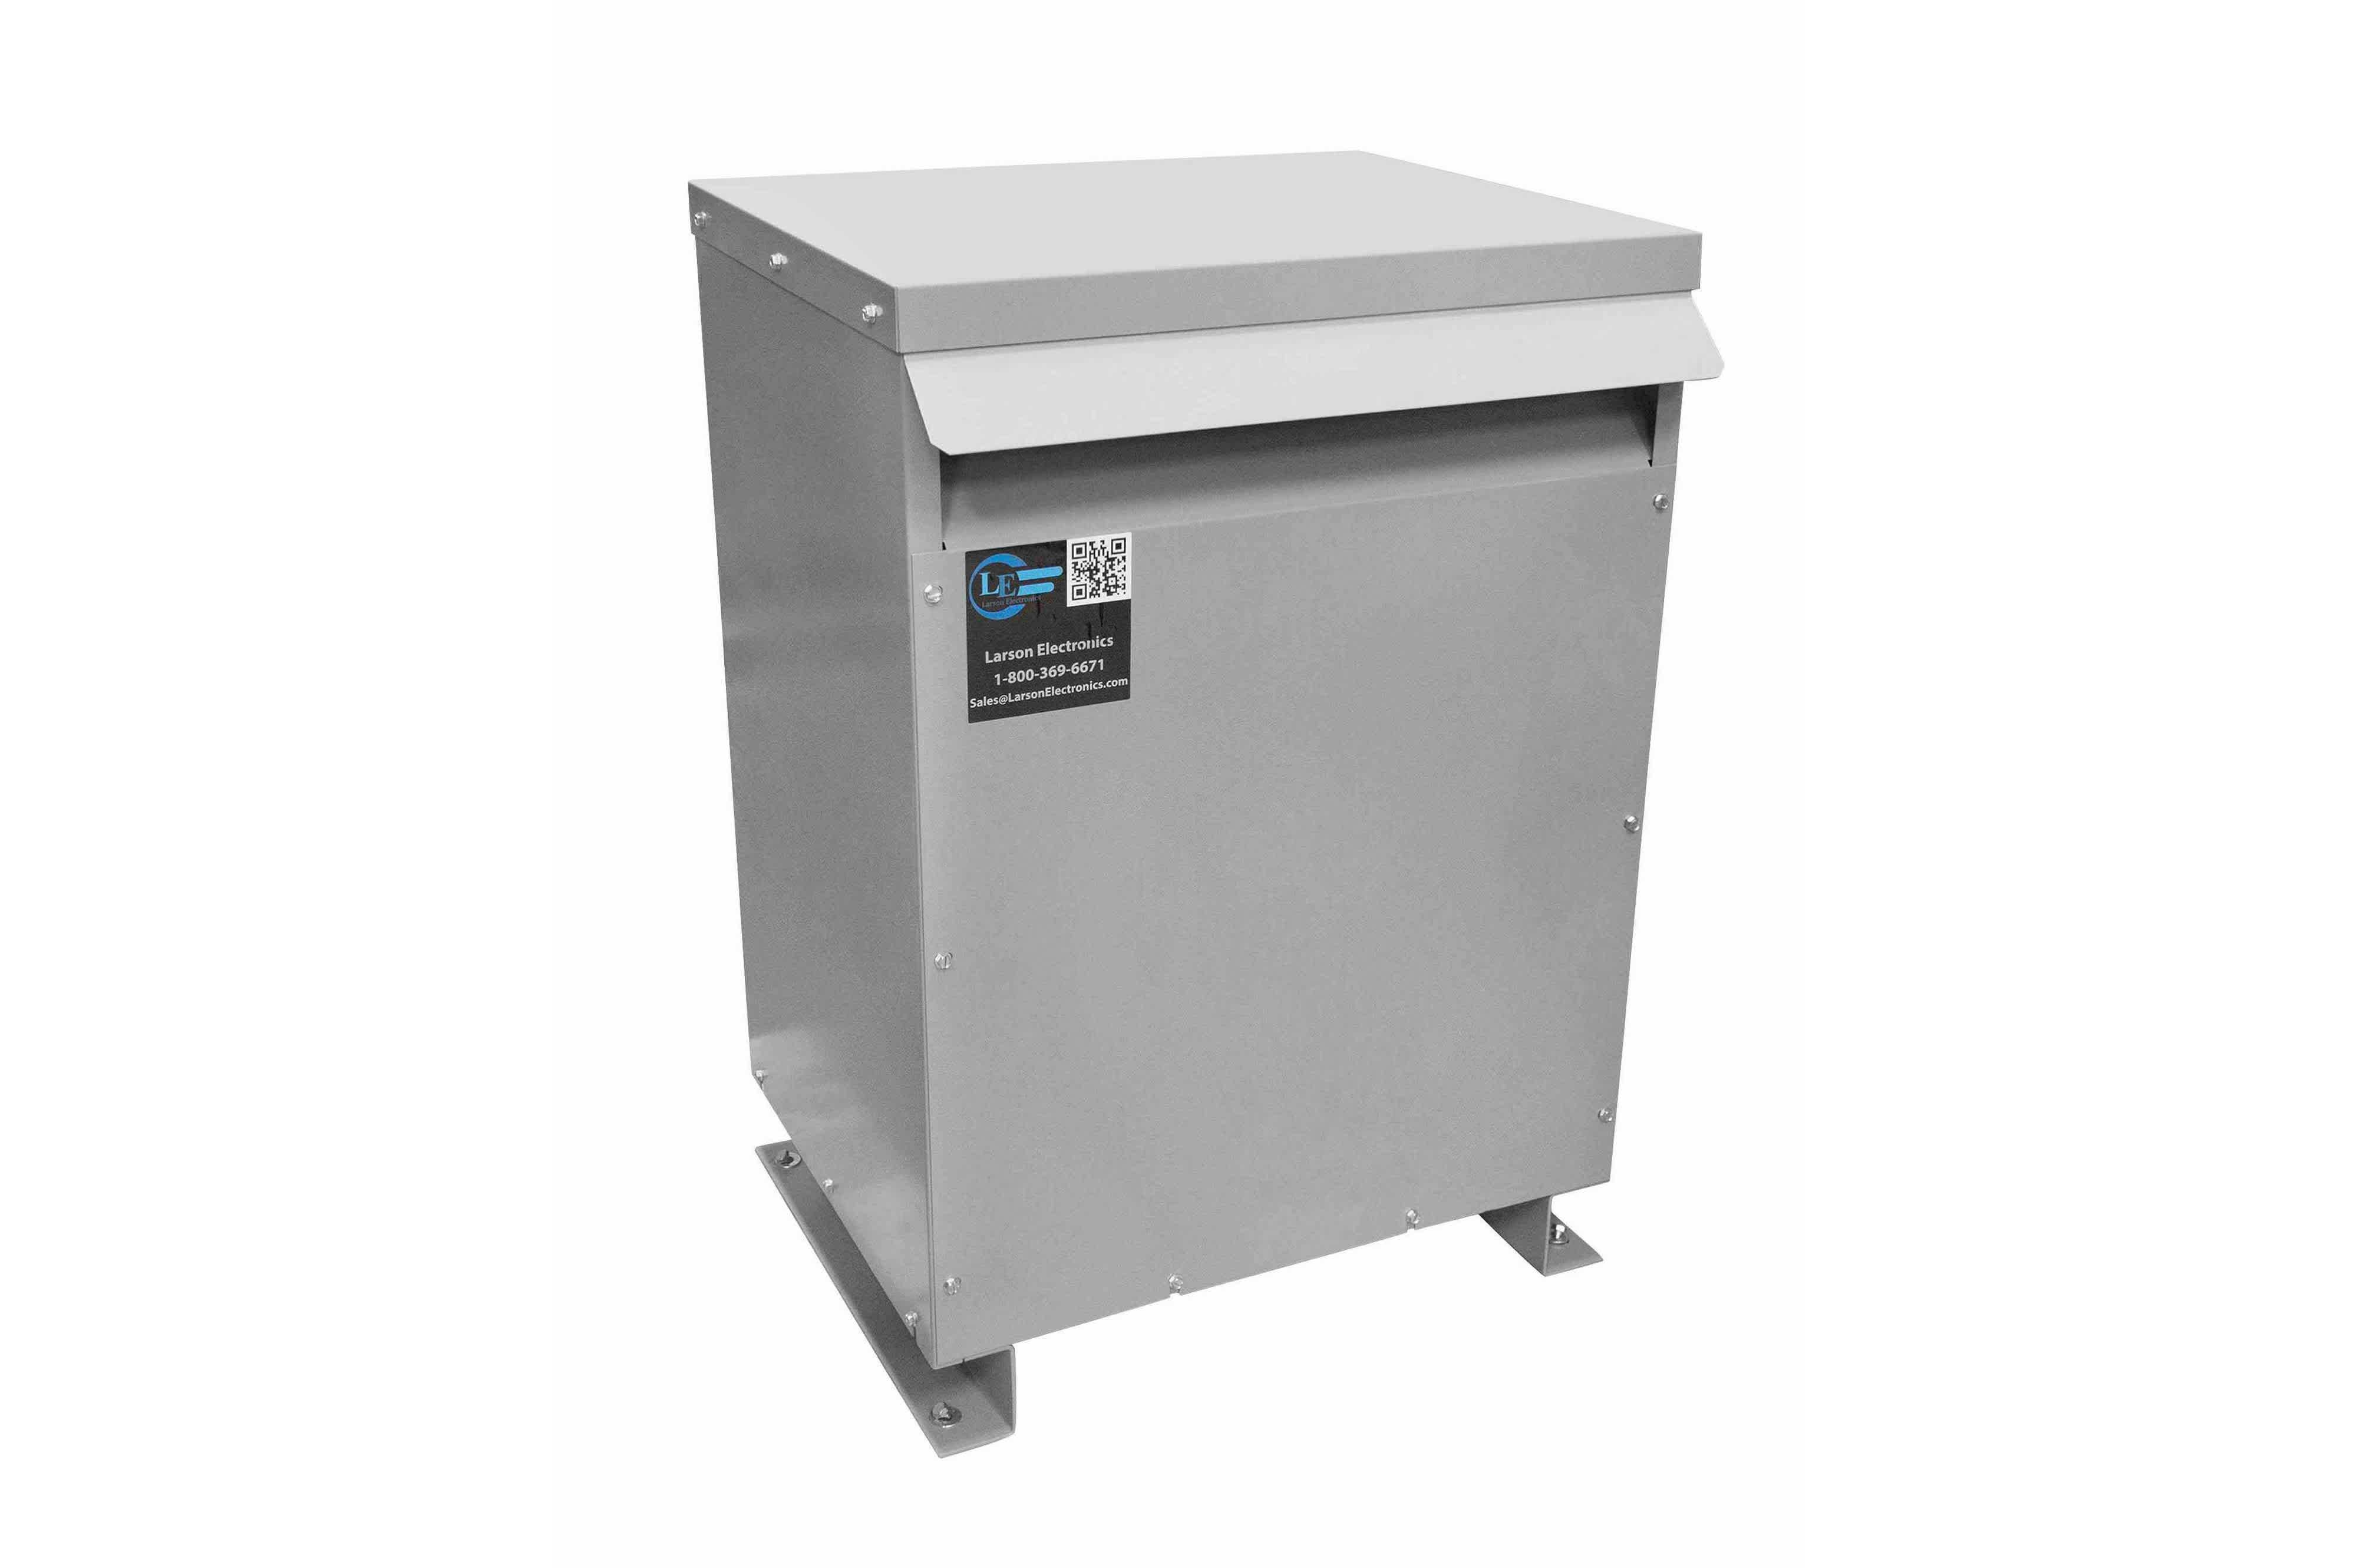 225 kVA 3PH Isolation Transformer, 208V Wye Primary, 400V Delta Secondary, N3R, Ventilated, 60 Hz